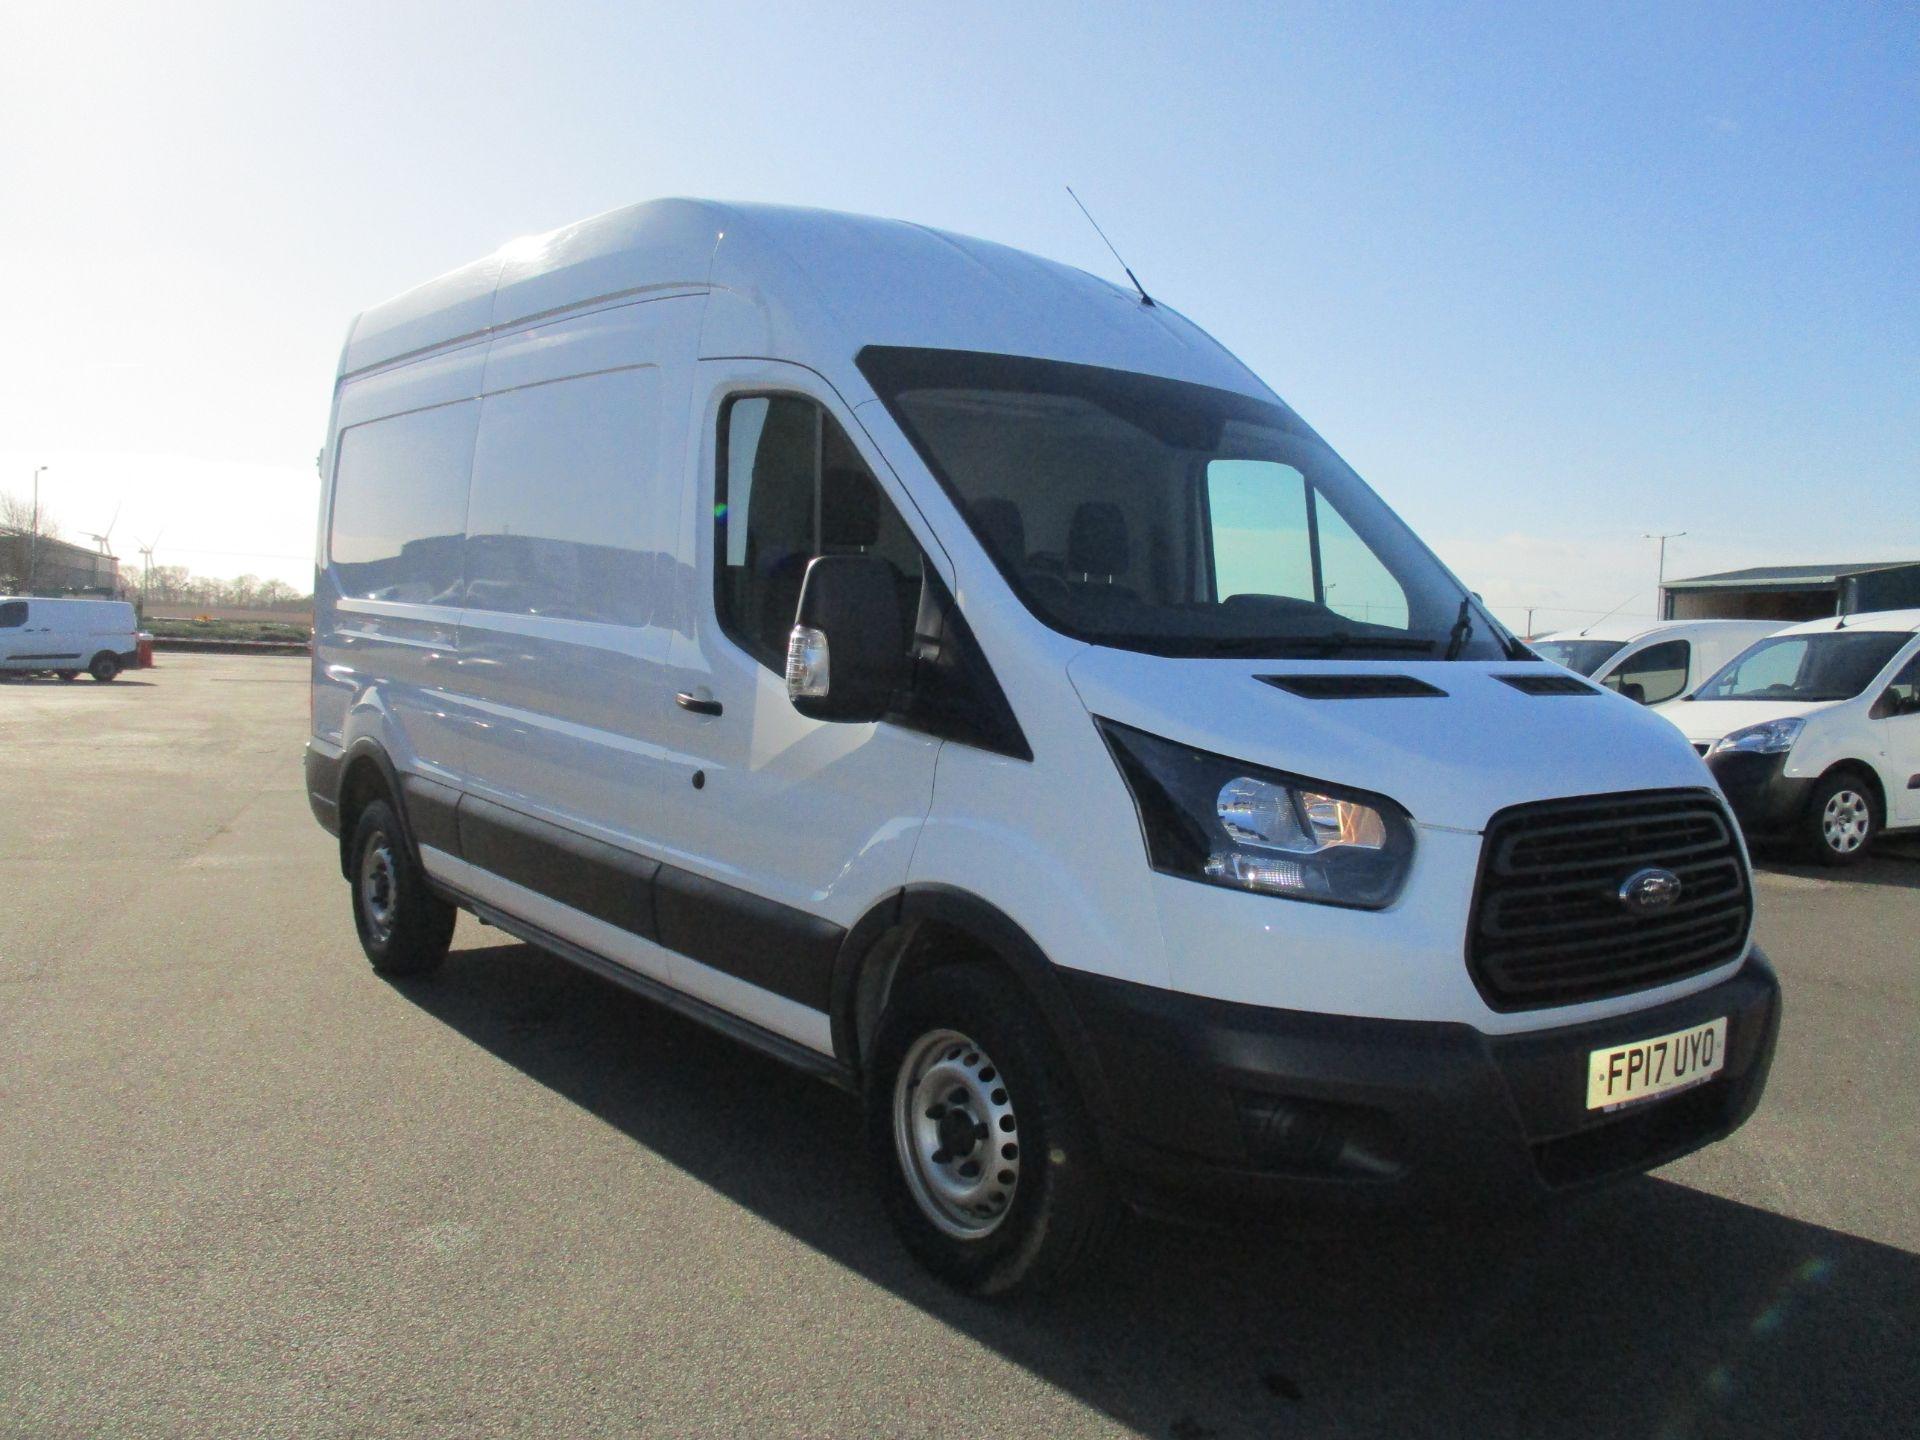 2017 Ford Transit L3 H3 VAN 130PS EURO 6 (FP17UYO)